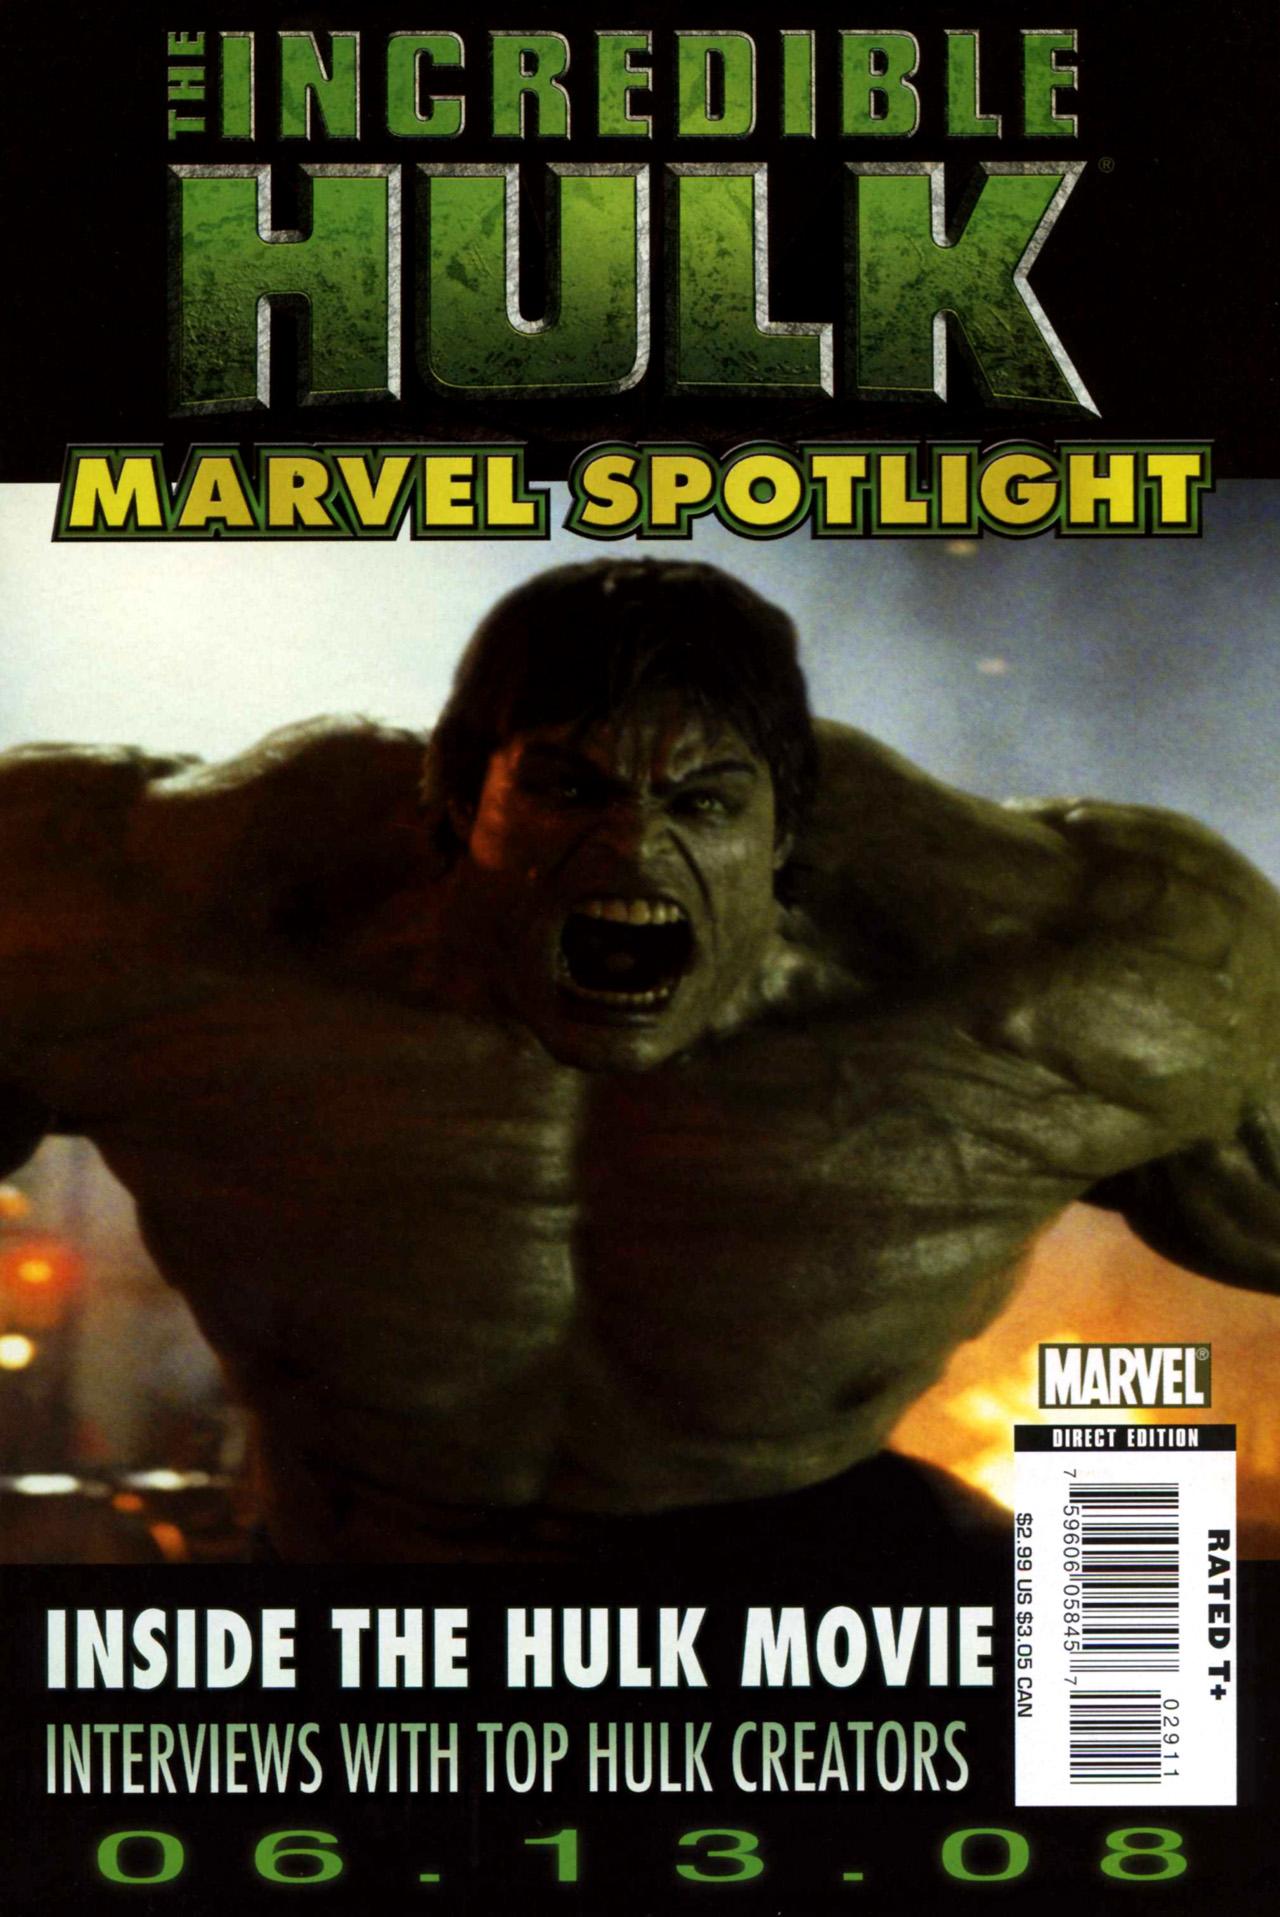 Marvel Spotlight: Incredible Hulk Vol 1 1